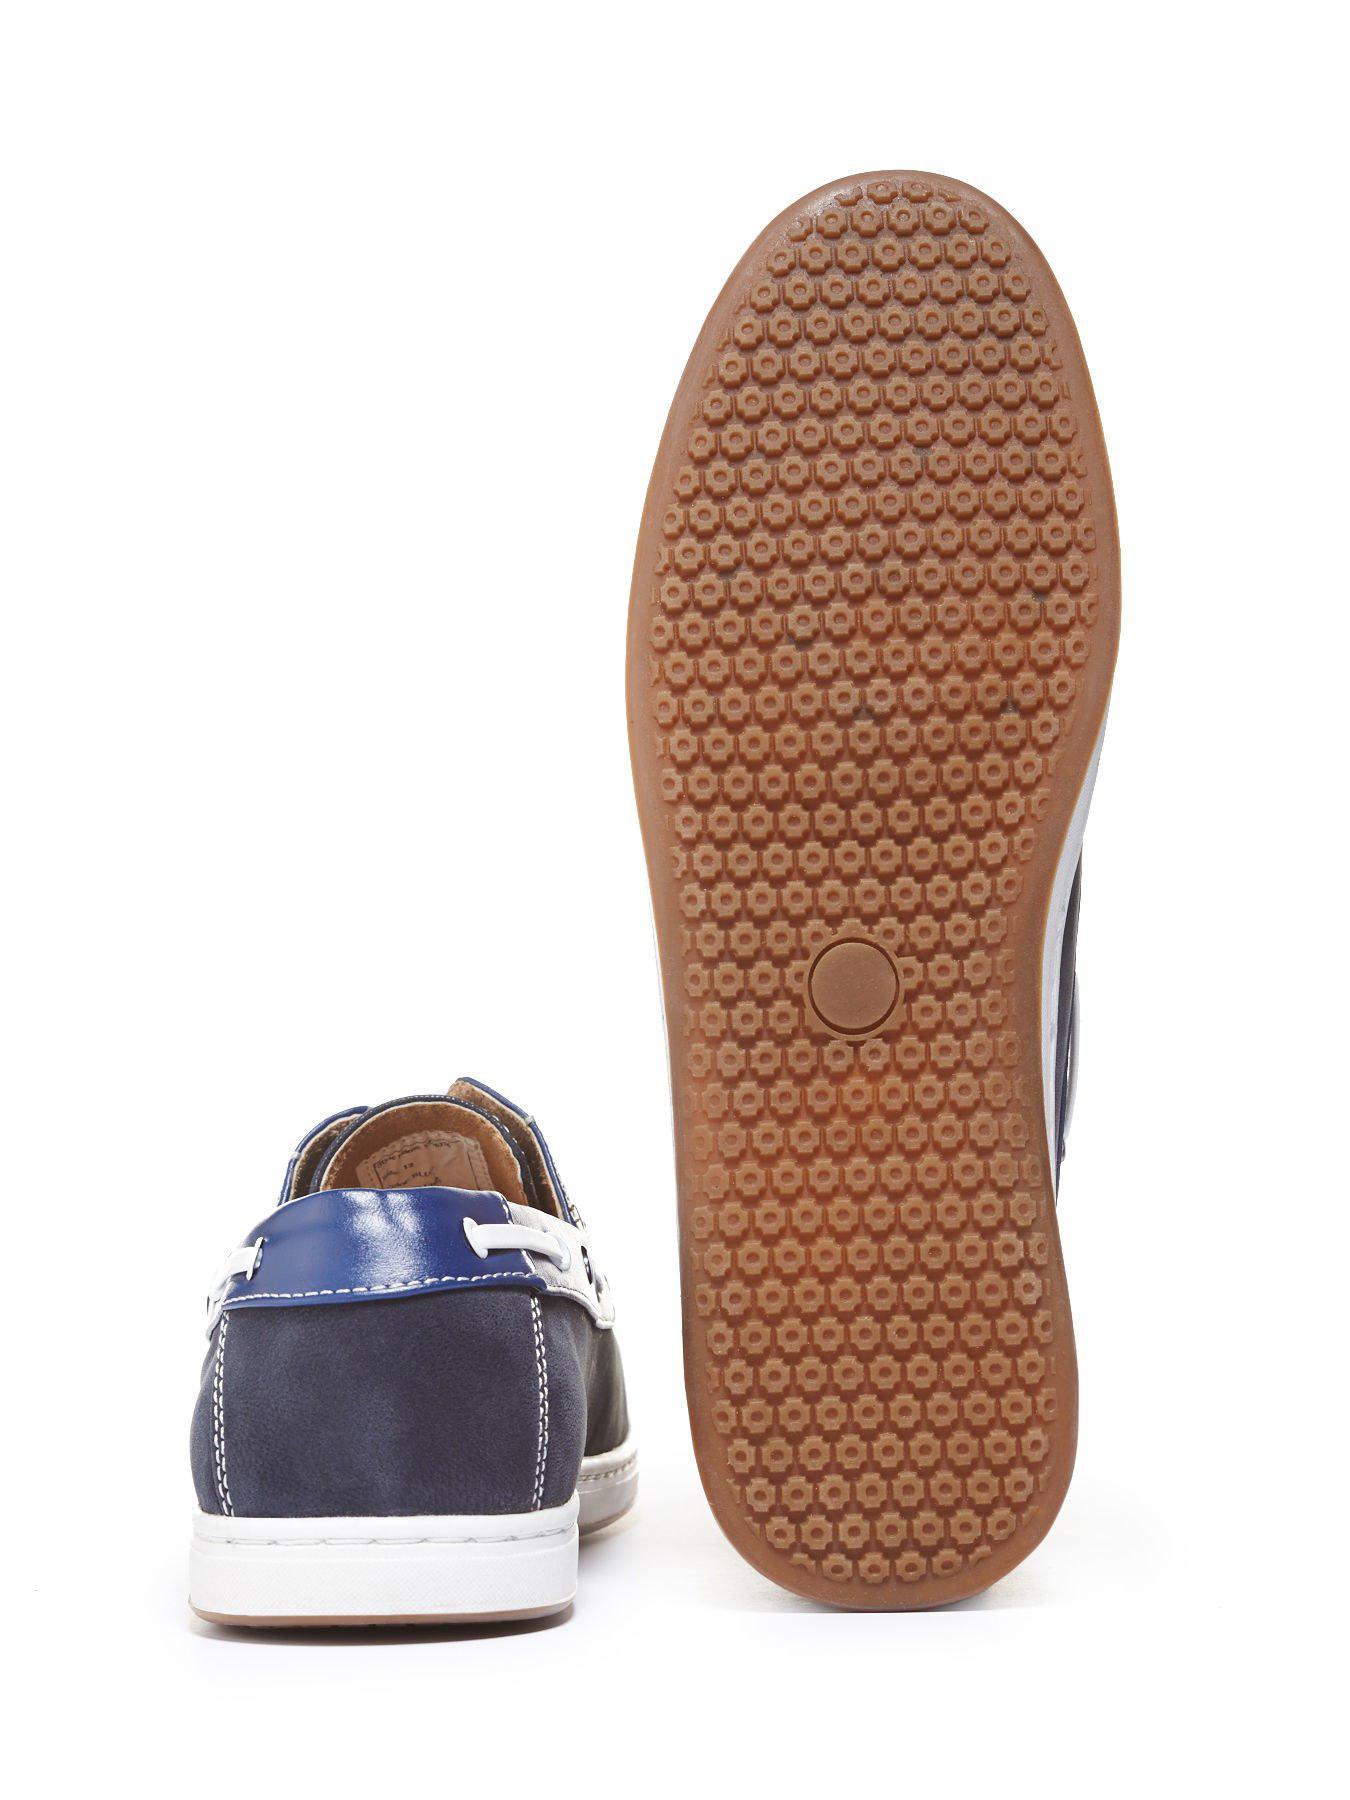 e7fa0f4e4f0b Lyst - Perry Ellis Fisher Athletic Boat Shoe in Black for Men